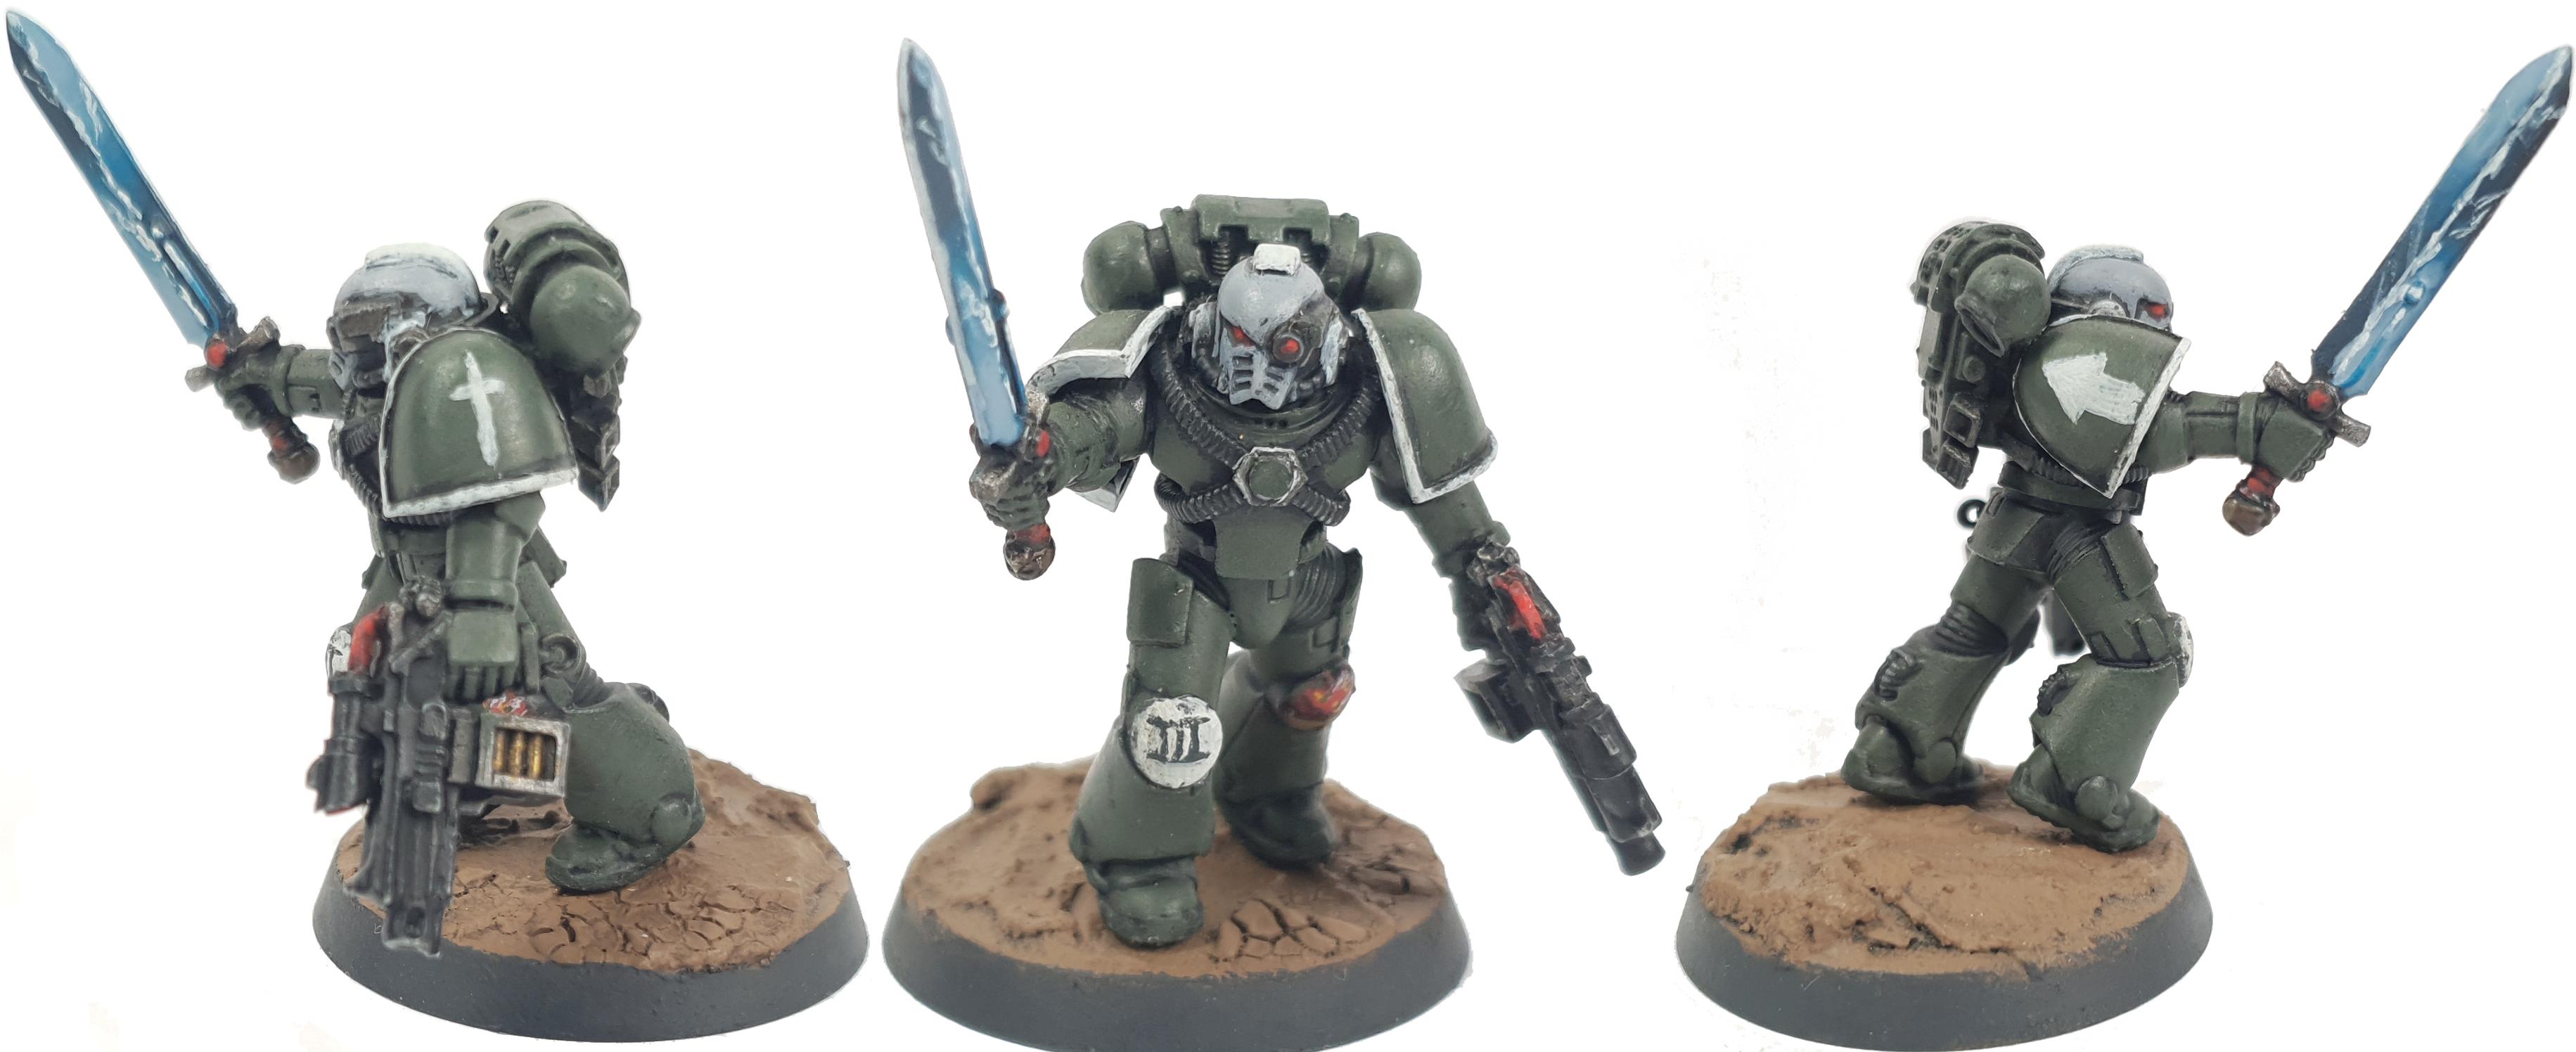 Sword of Davion Space Marine Tactical Squad Veteran Sergeant